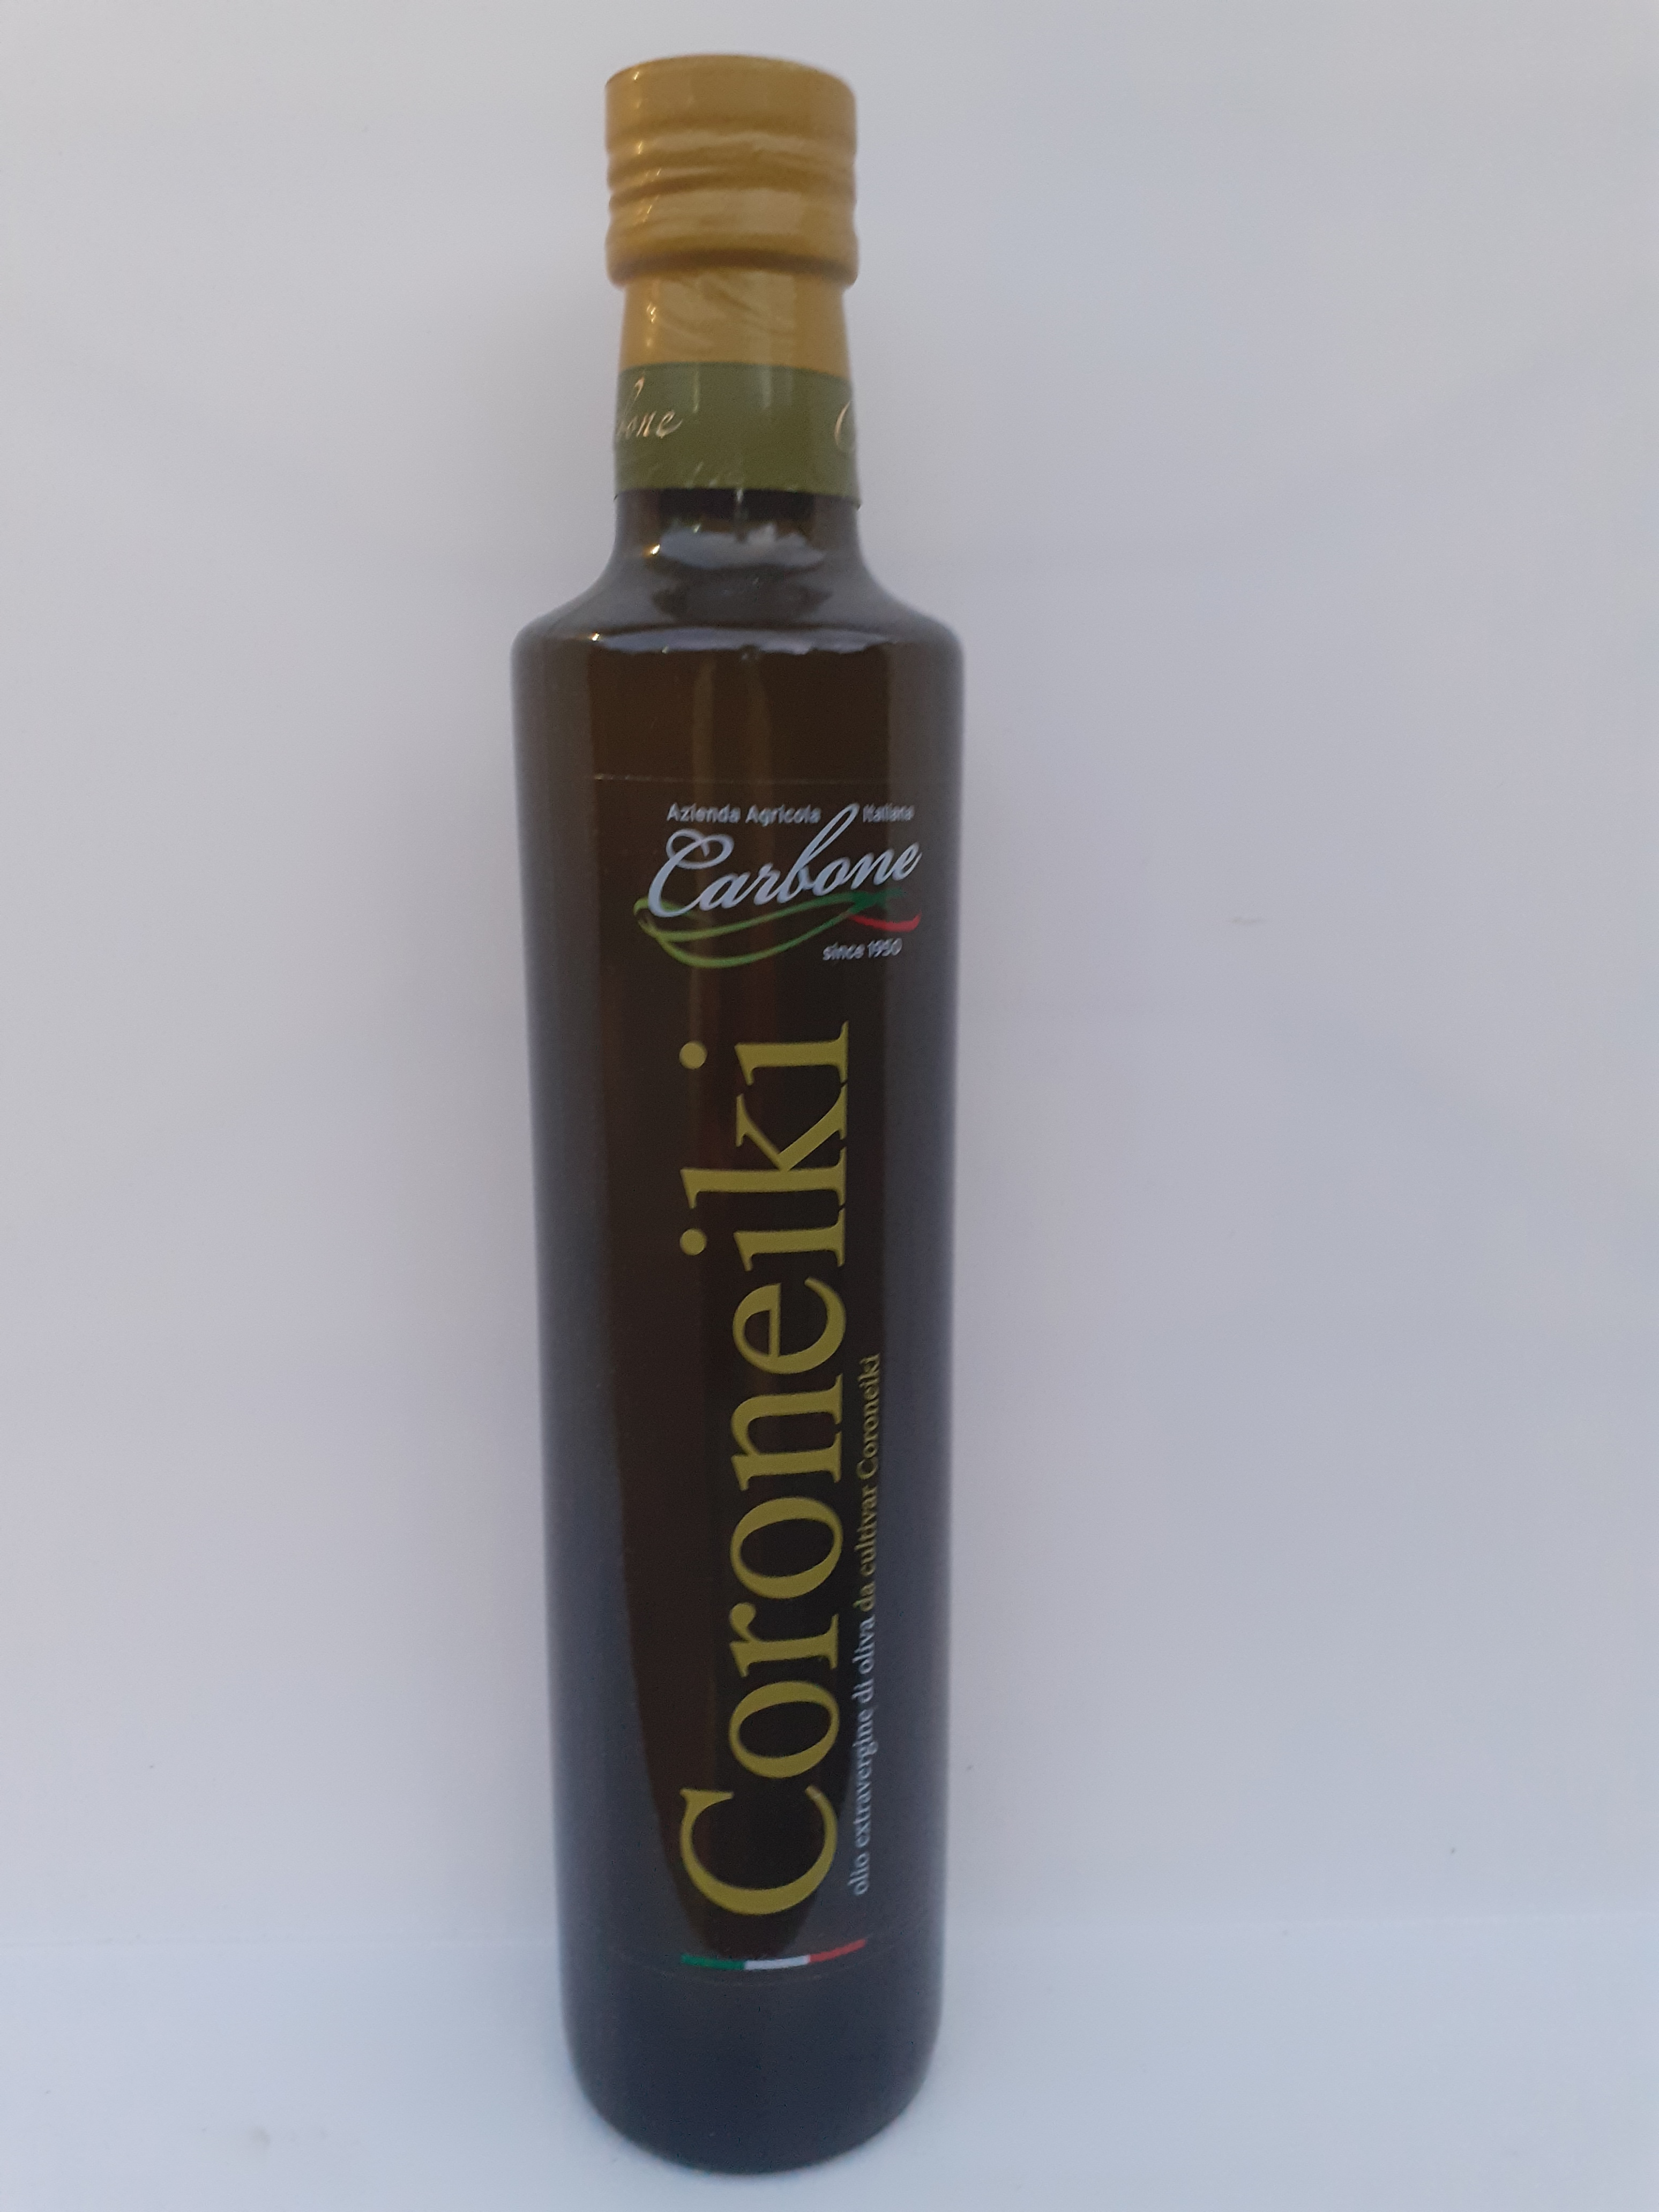 Olio Extravergine di Oliva Coroneiki 0.75. Azienda Agricola Carbone laureana di Borrello (RC).